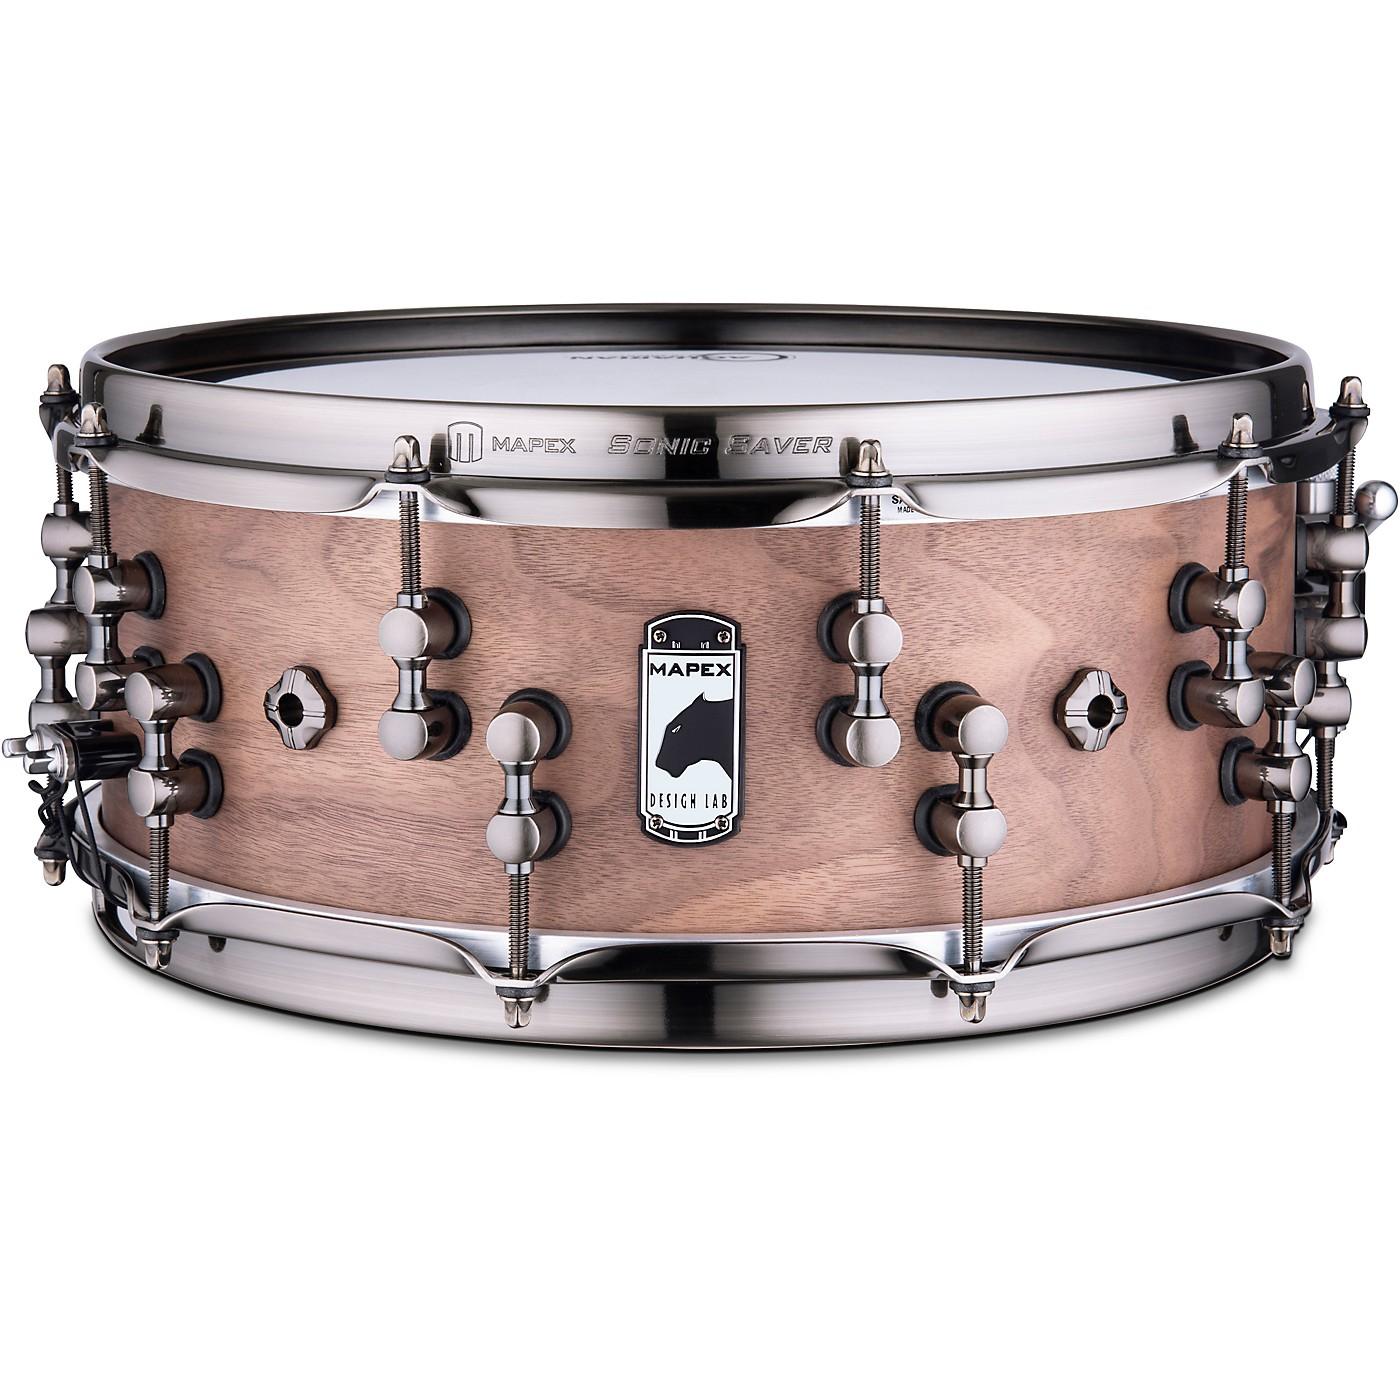 Mapex Black Panther Design Lab Snare Drum Machine